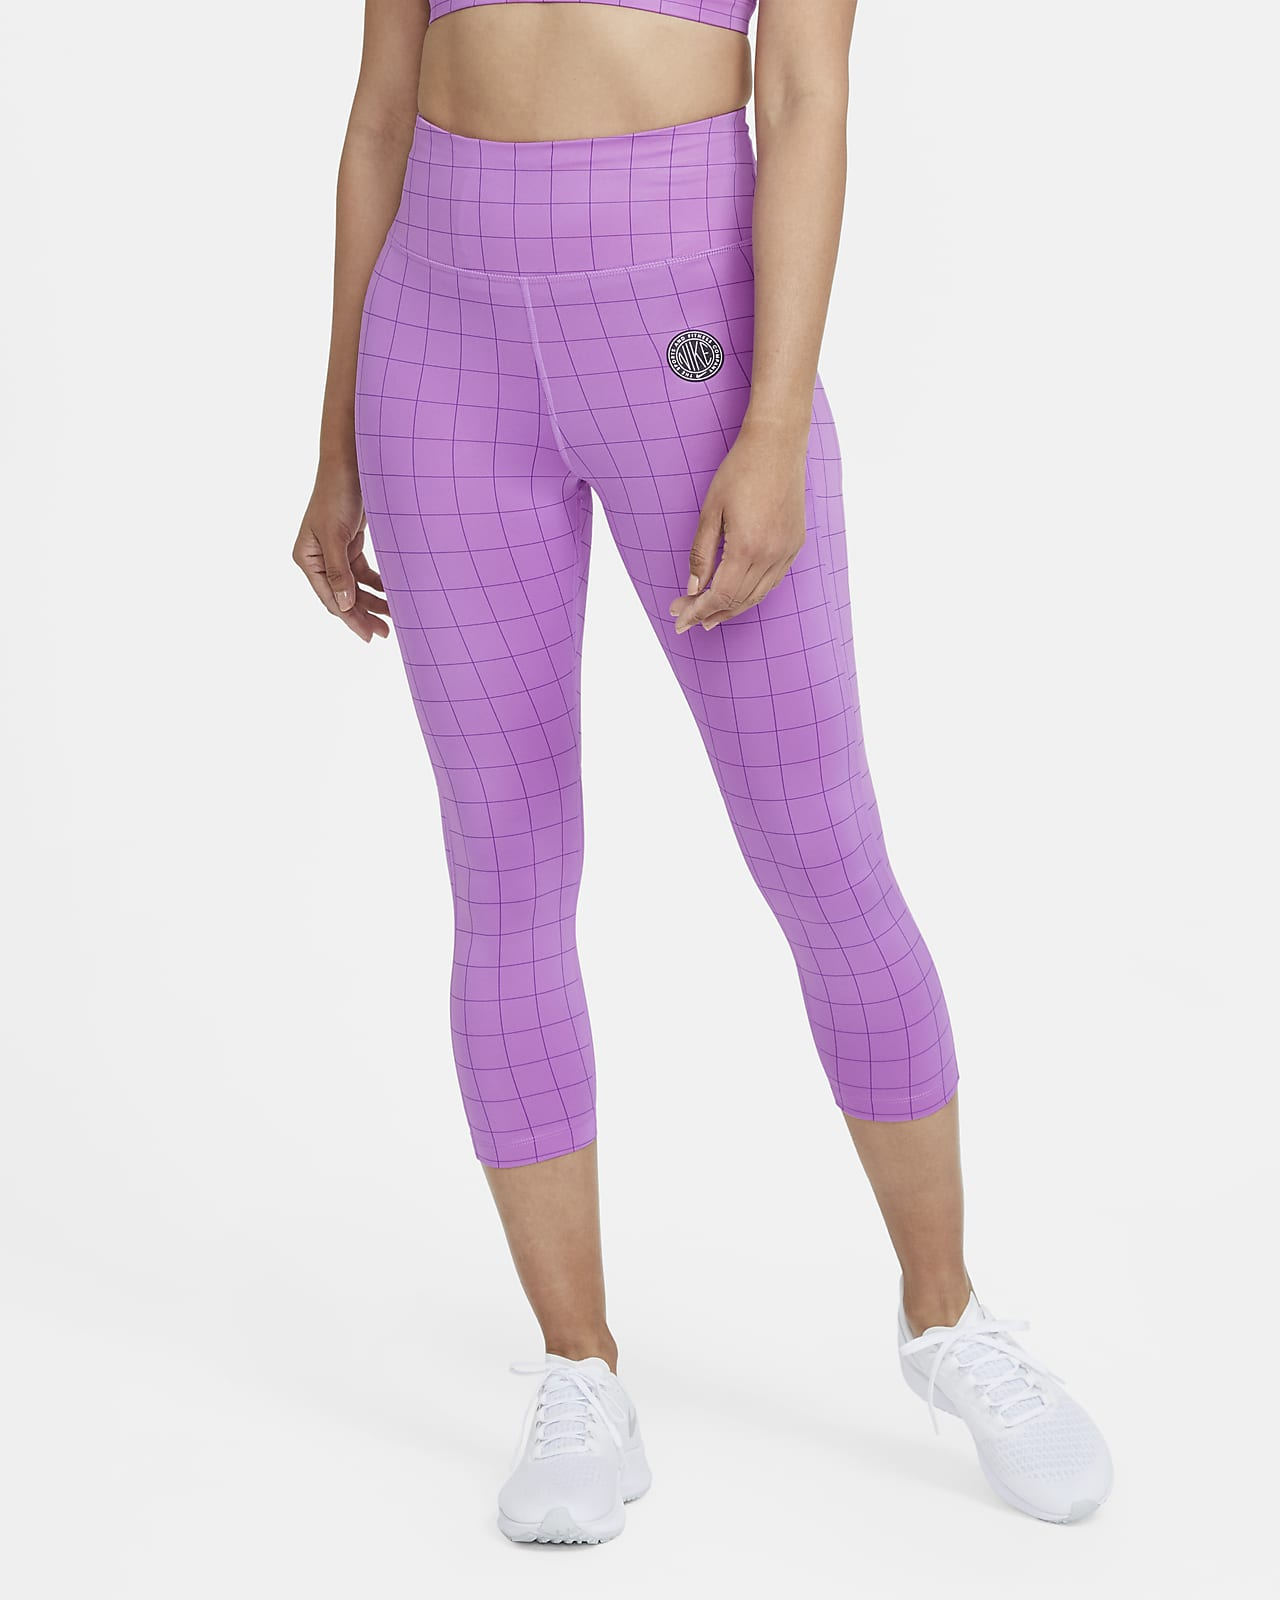 Nike Epic Fast Femme 女款中腰短版跑步內搭褲